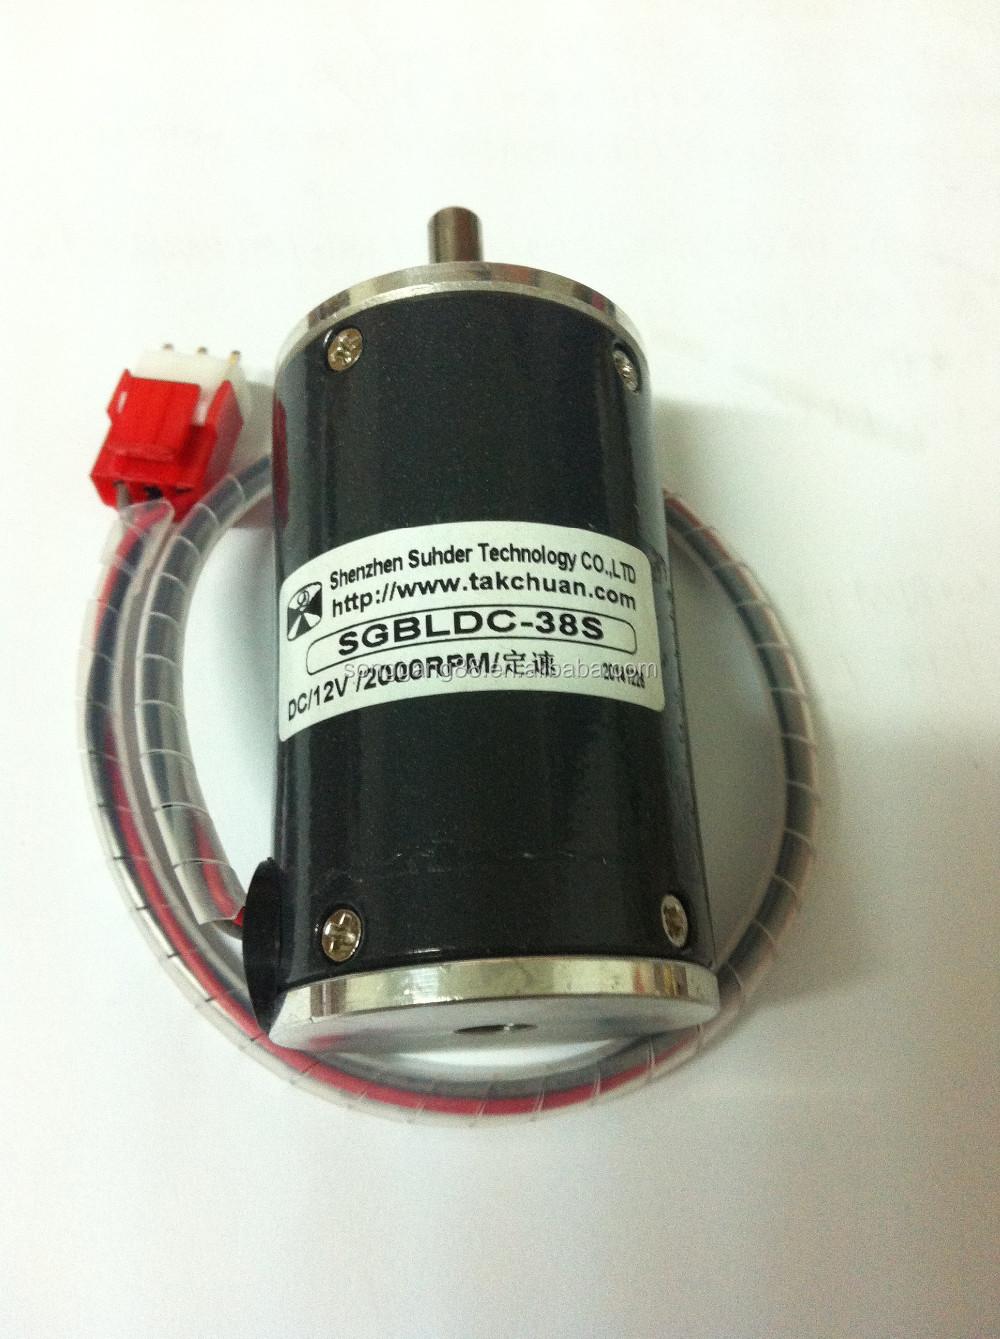 SGBLDC-38S DC12V 2000RPM 20141226 (1).jpg